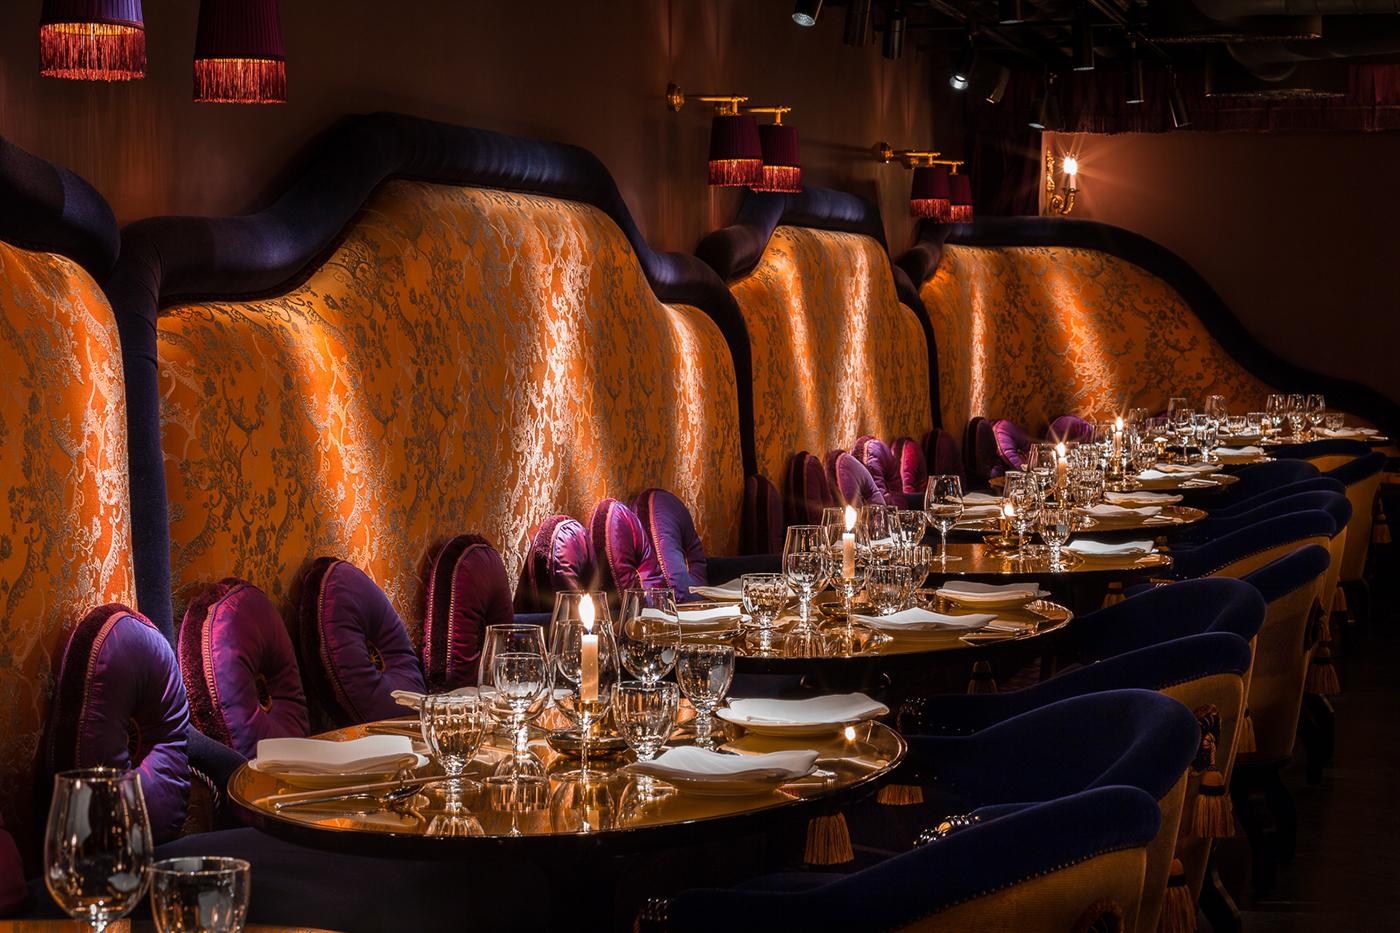 my-wanderlustnotes-i-3-migliori-ristoranti-cinesi-di-londra-park-chinois-dining